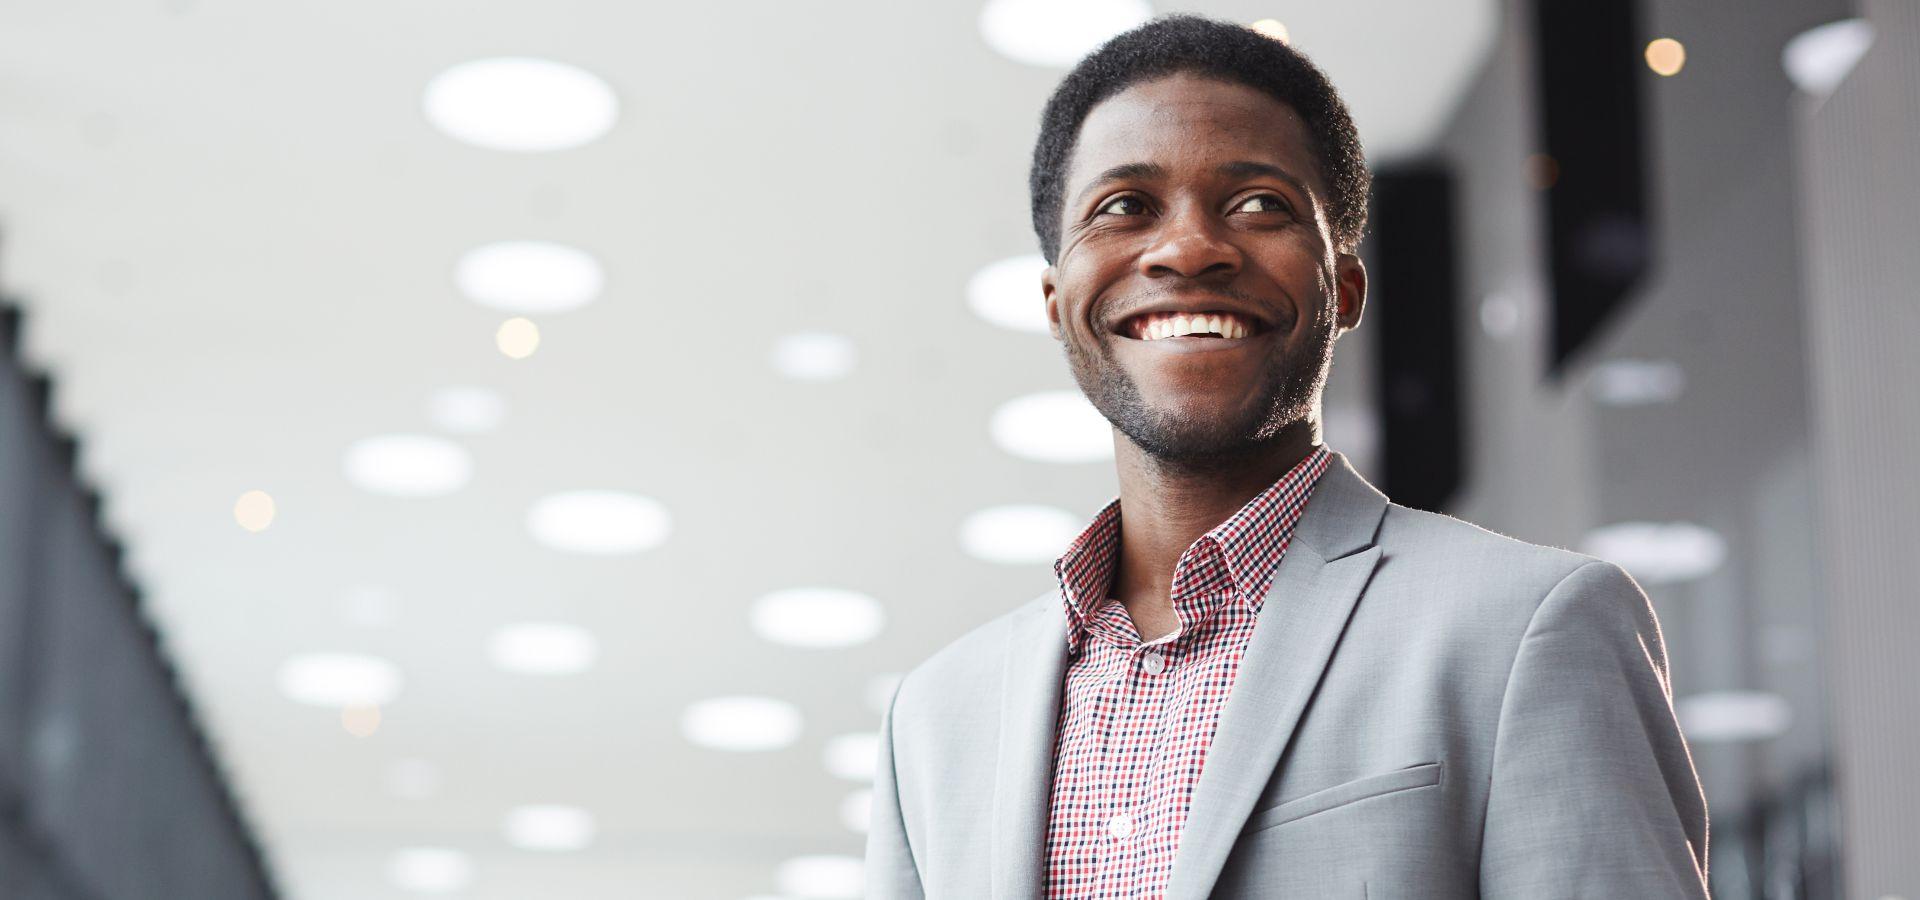 Corporate black man smiling